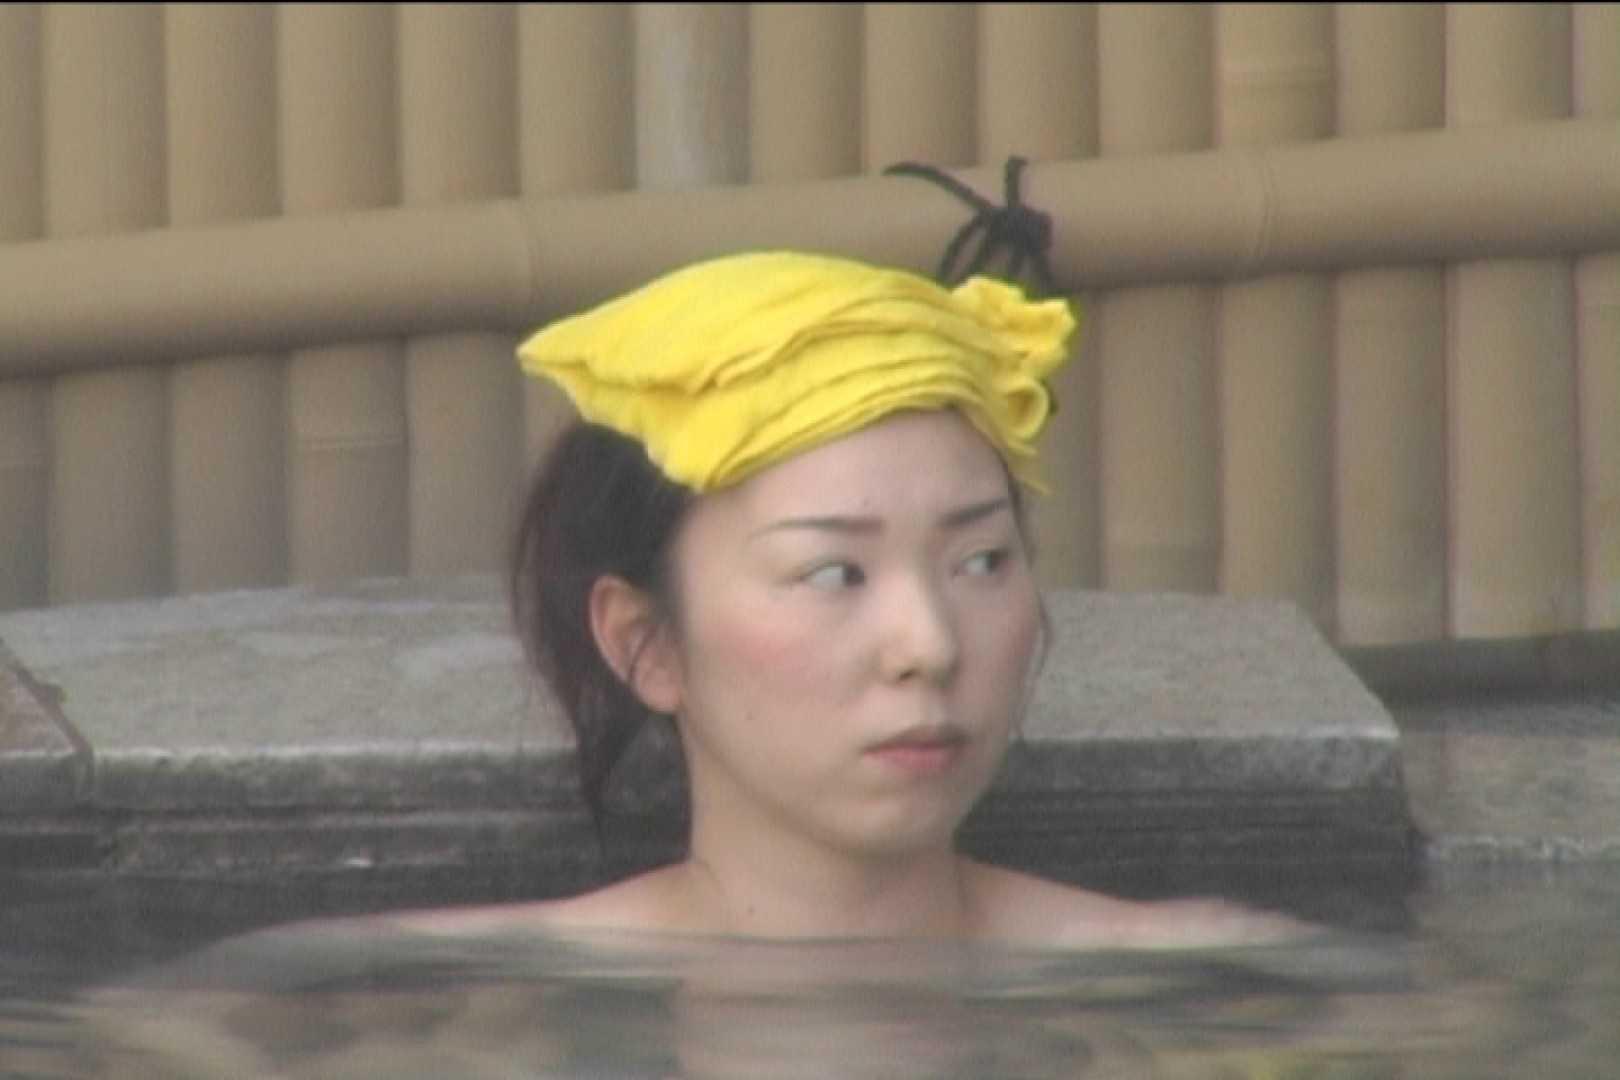 Aquaな露天風呂Vol.529 盗撮映像  51Pix 21